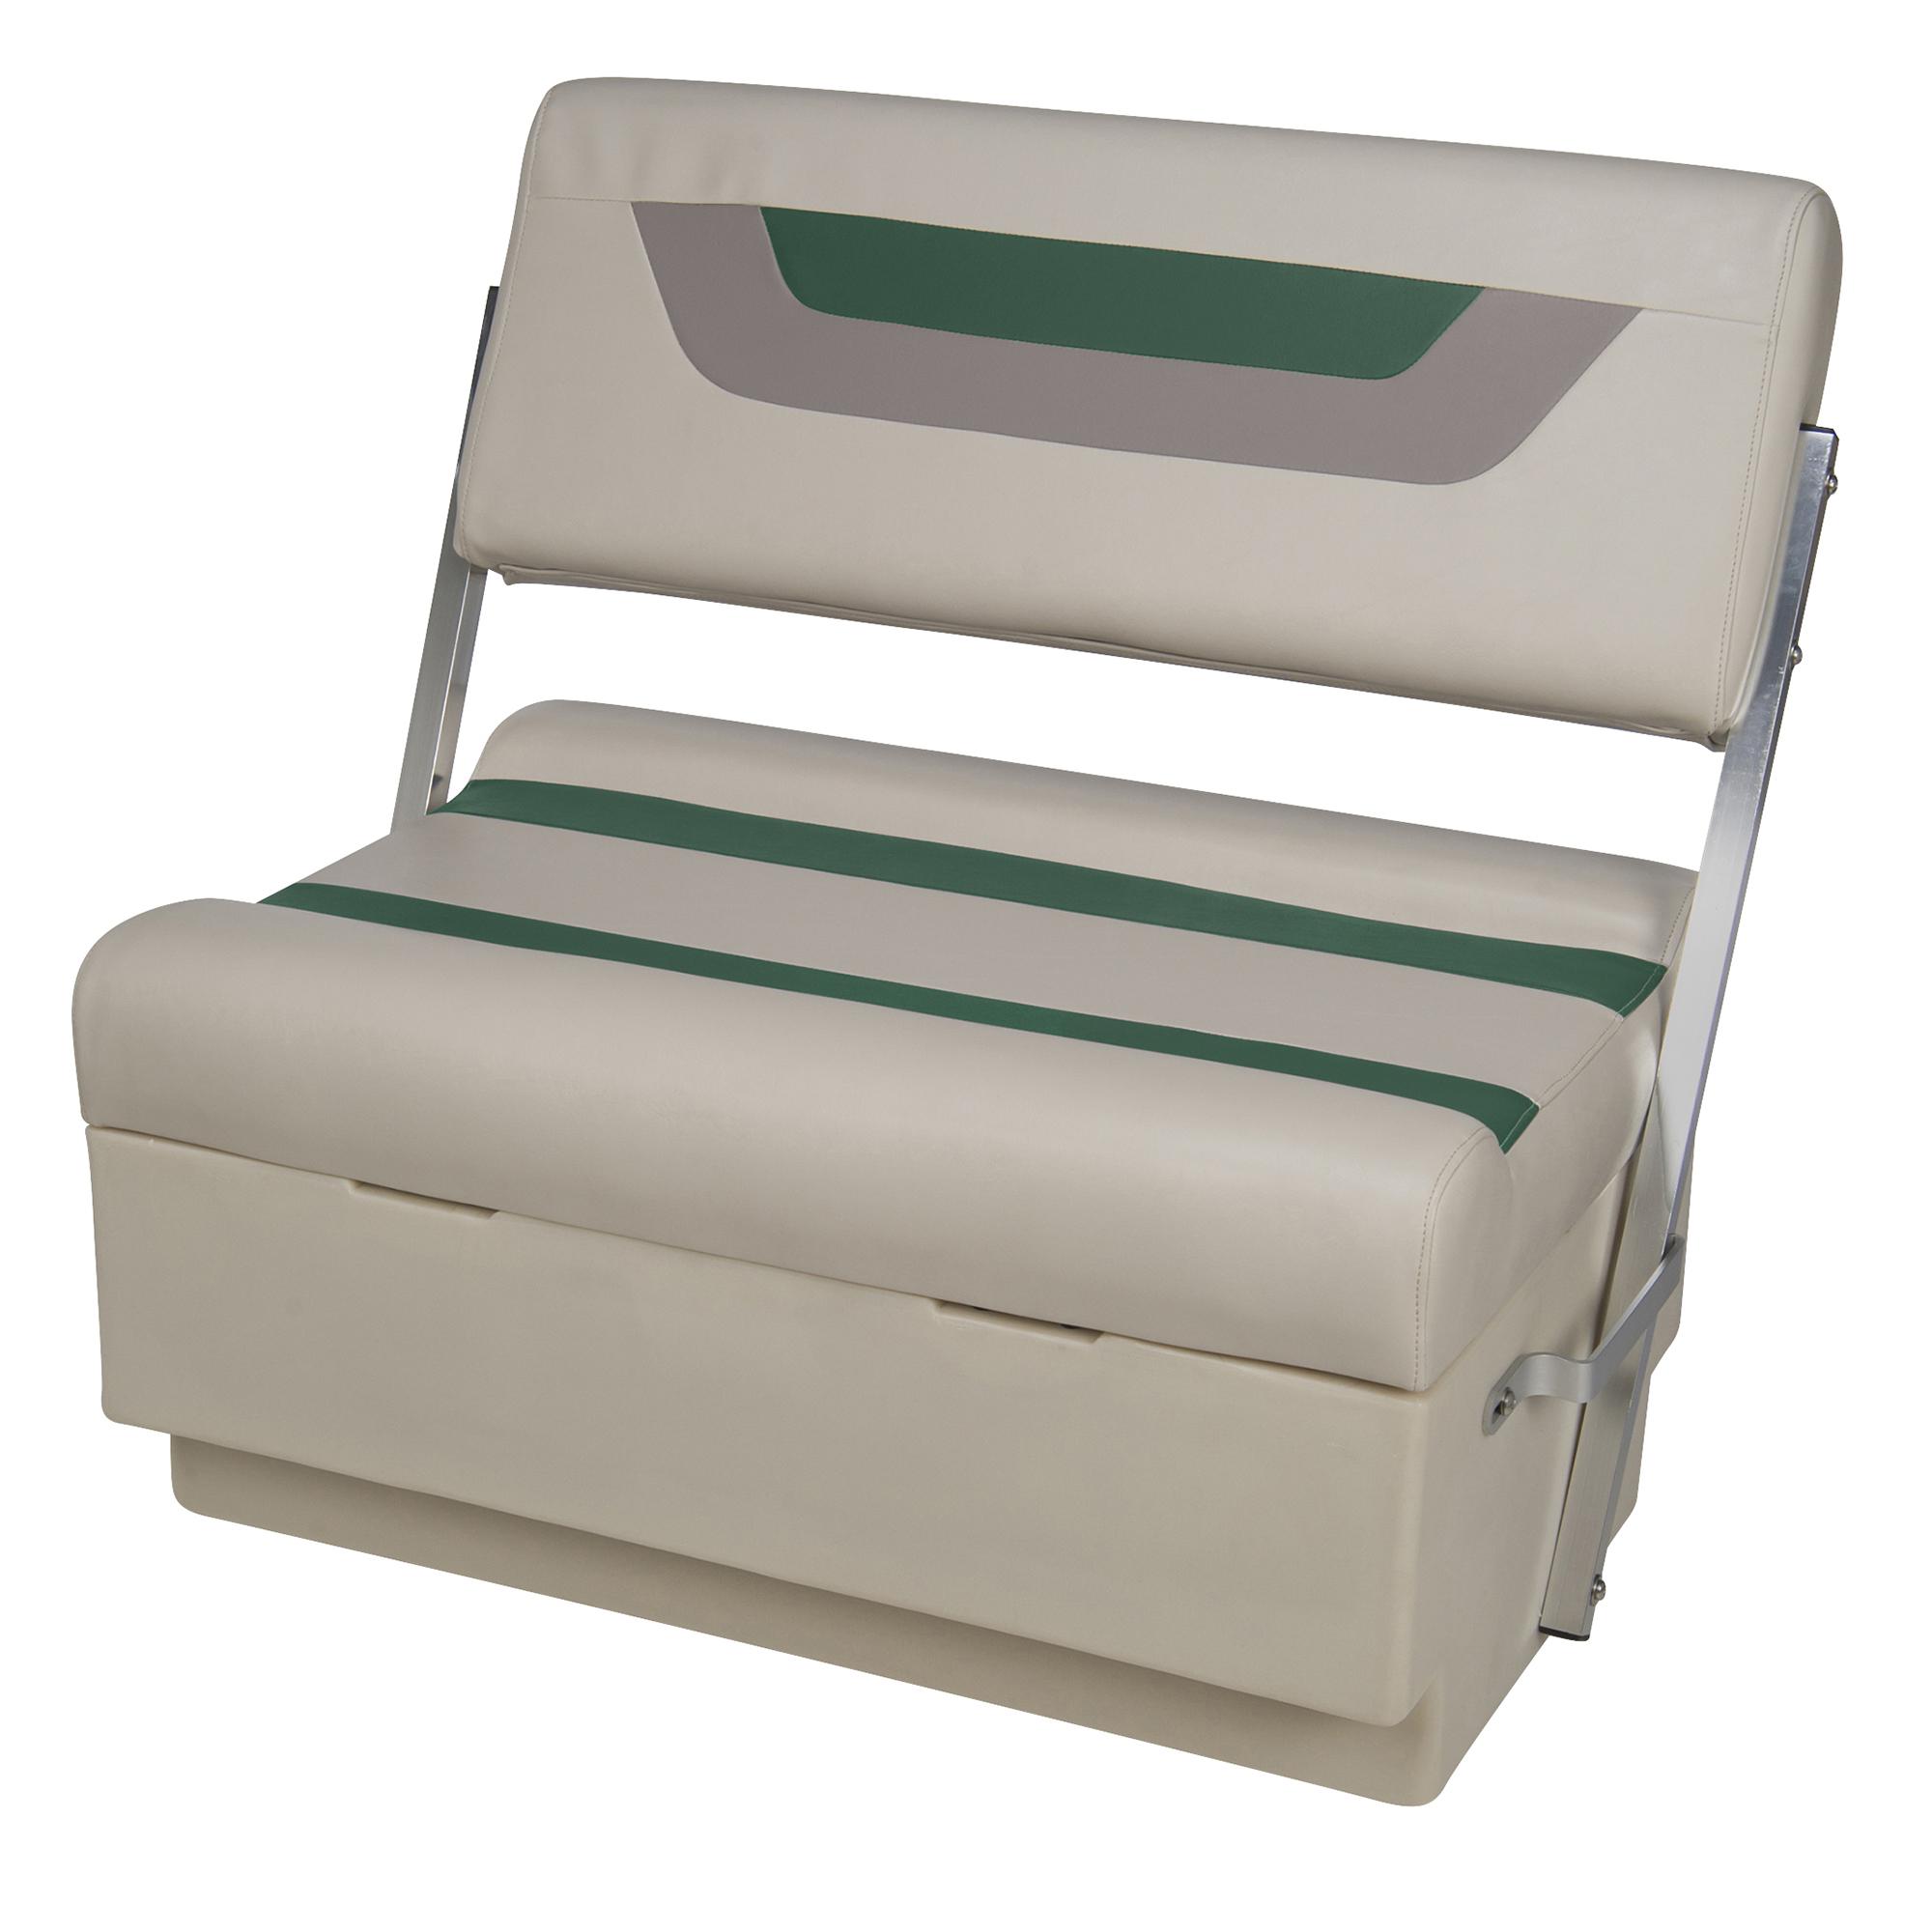 Toonmate Designer Pontoon Flip-Flop Seat, Platinum